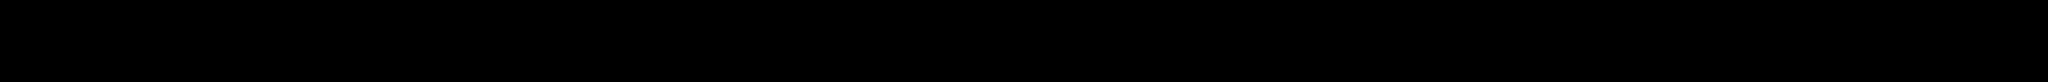 CARCOMMERCE Auton huurteenestoliinat